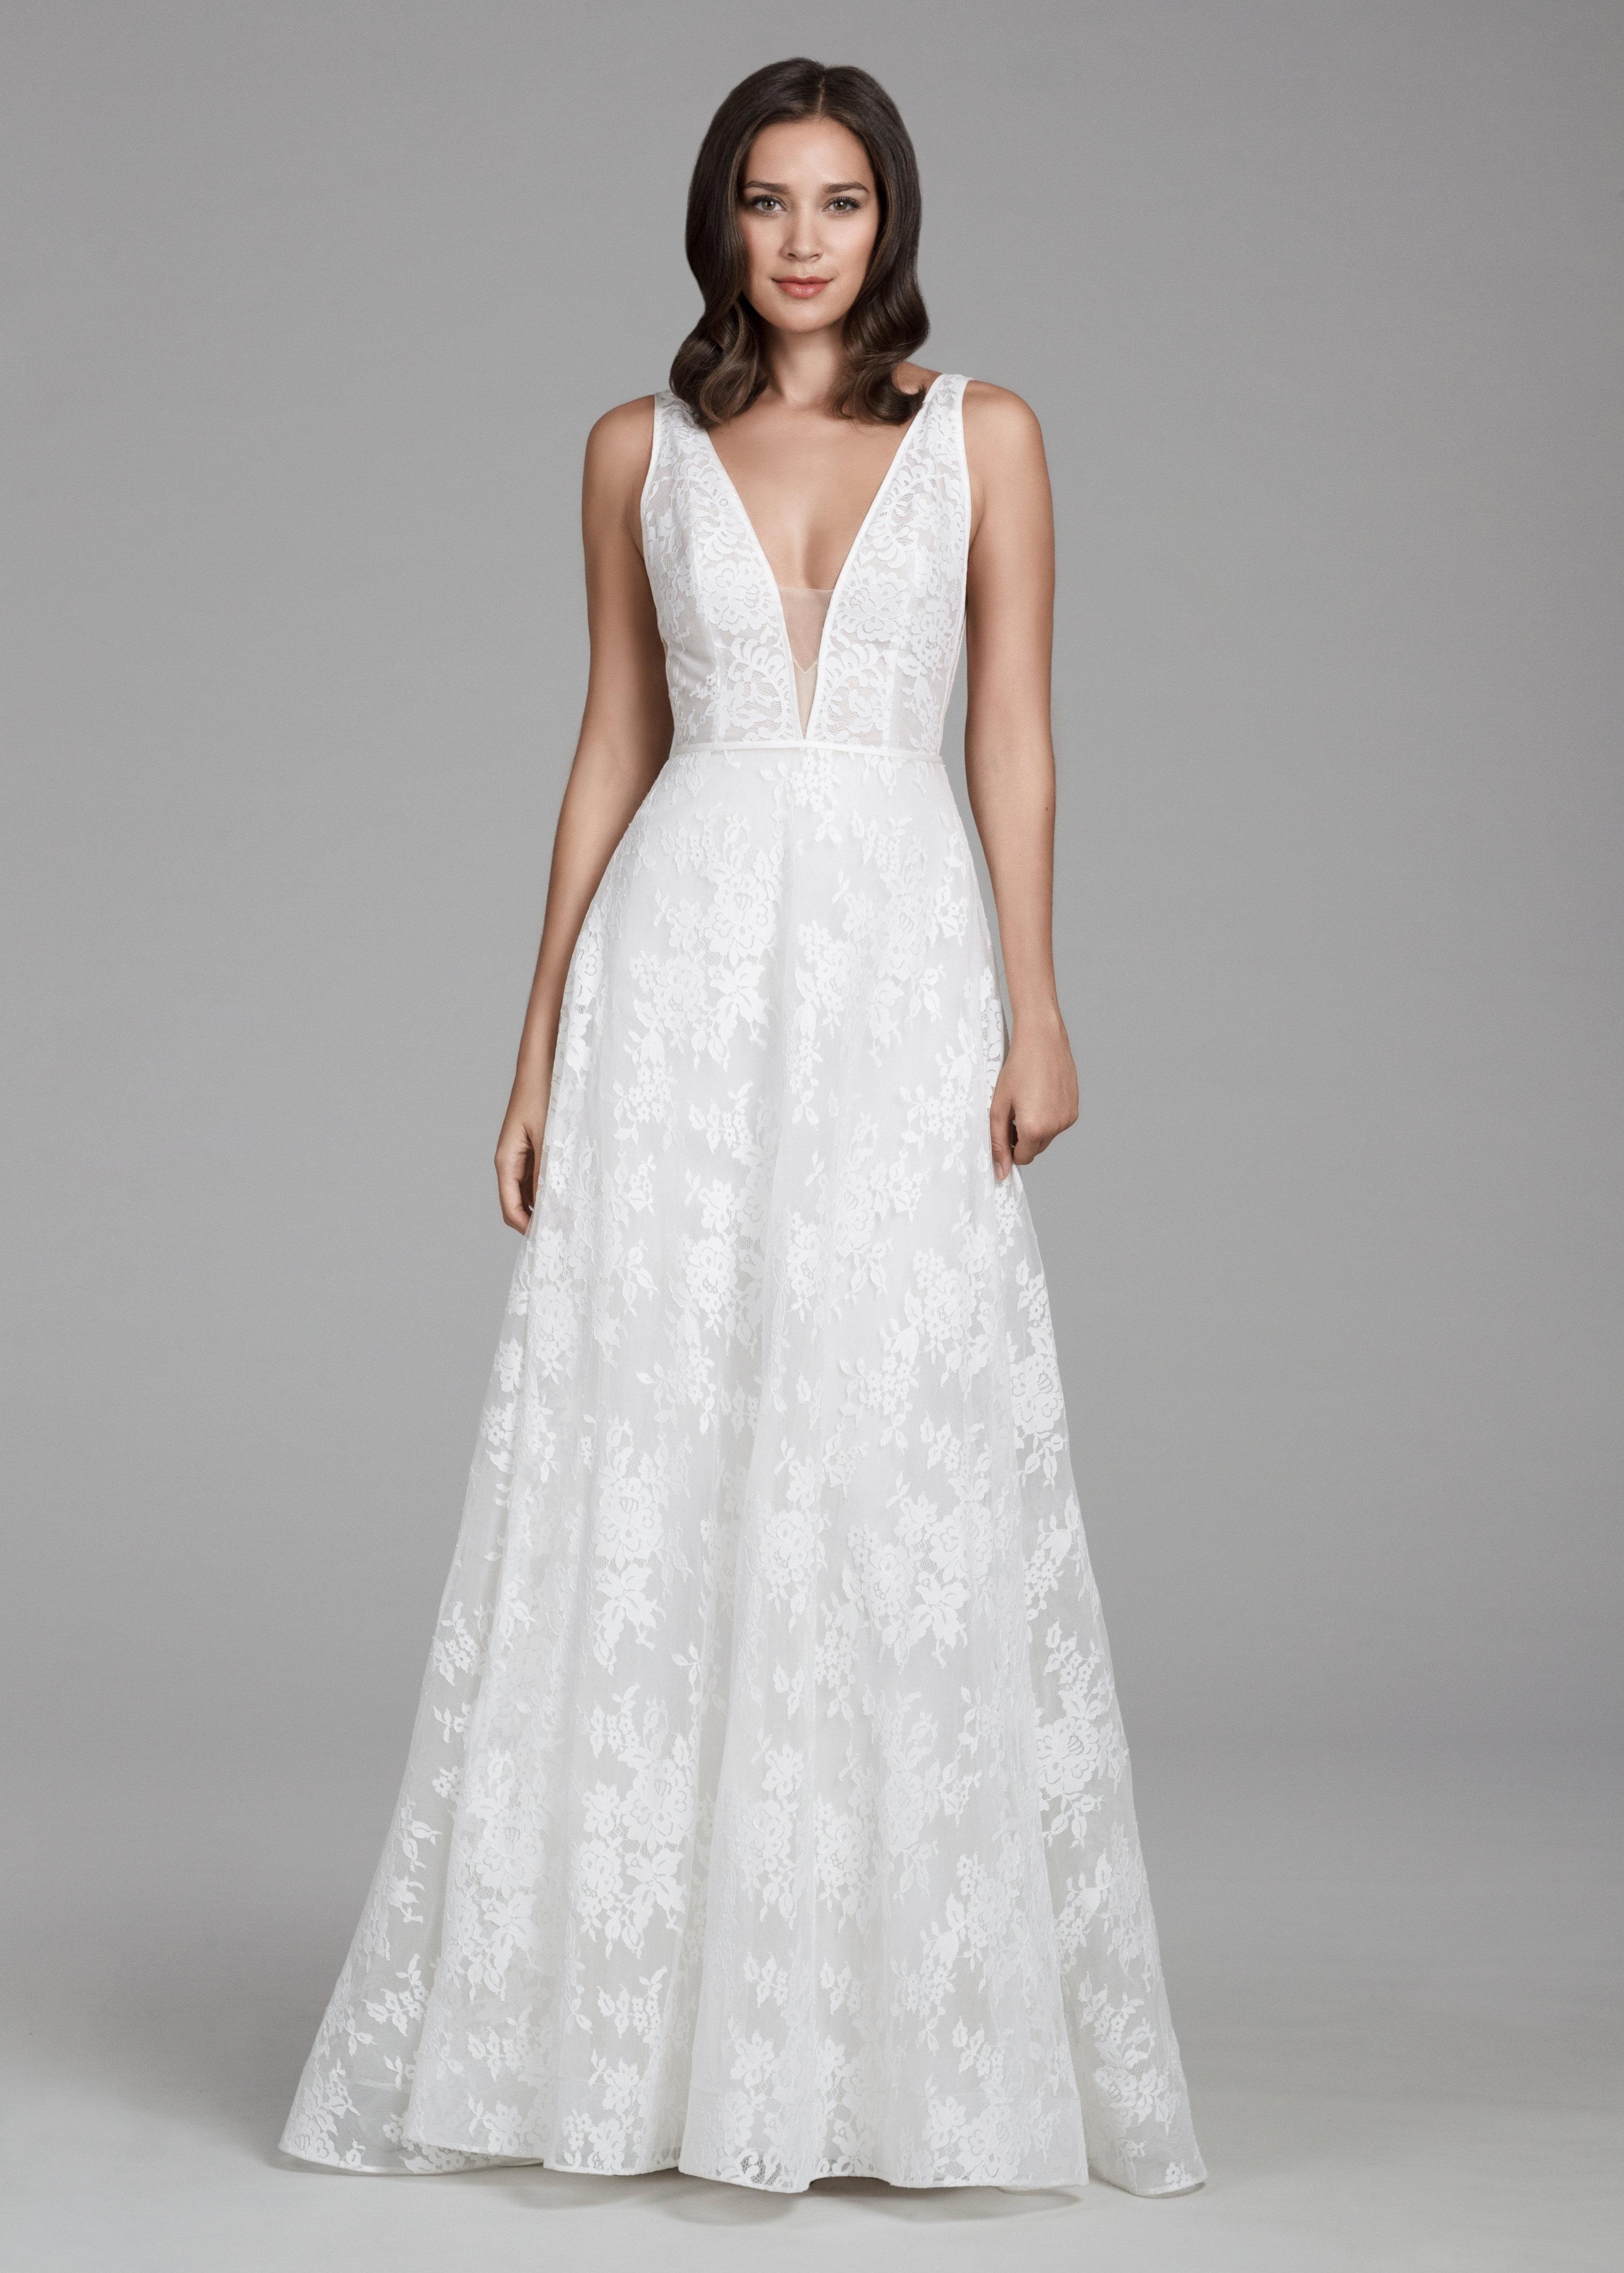 0d69c3c9634 Famous V Back Gown Elaboration - Evening Dresses Ball Gowns Mermaid ...